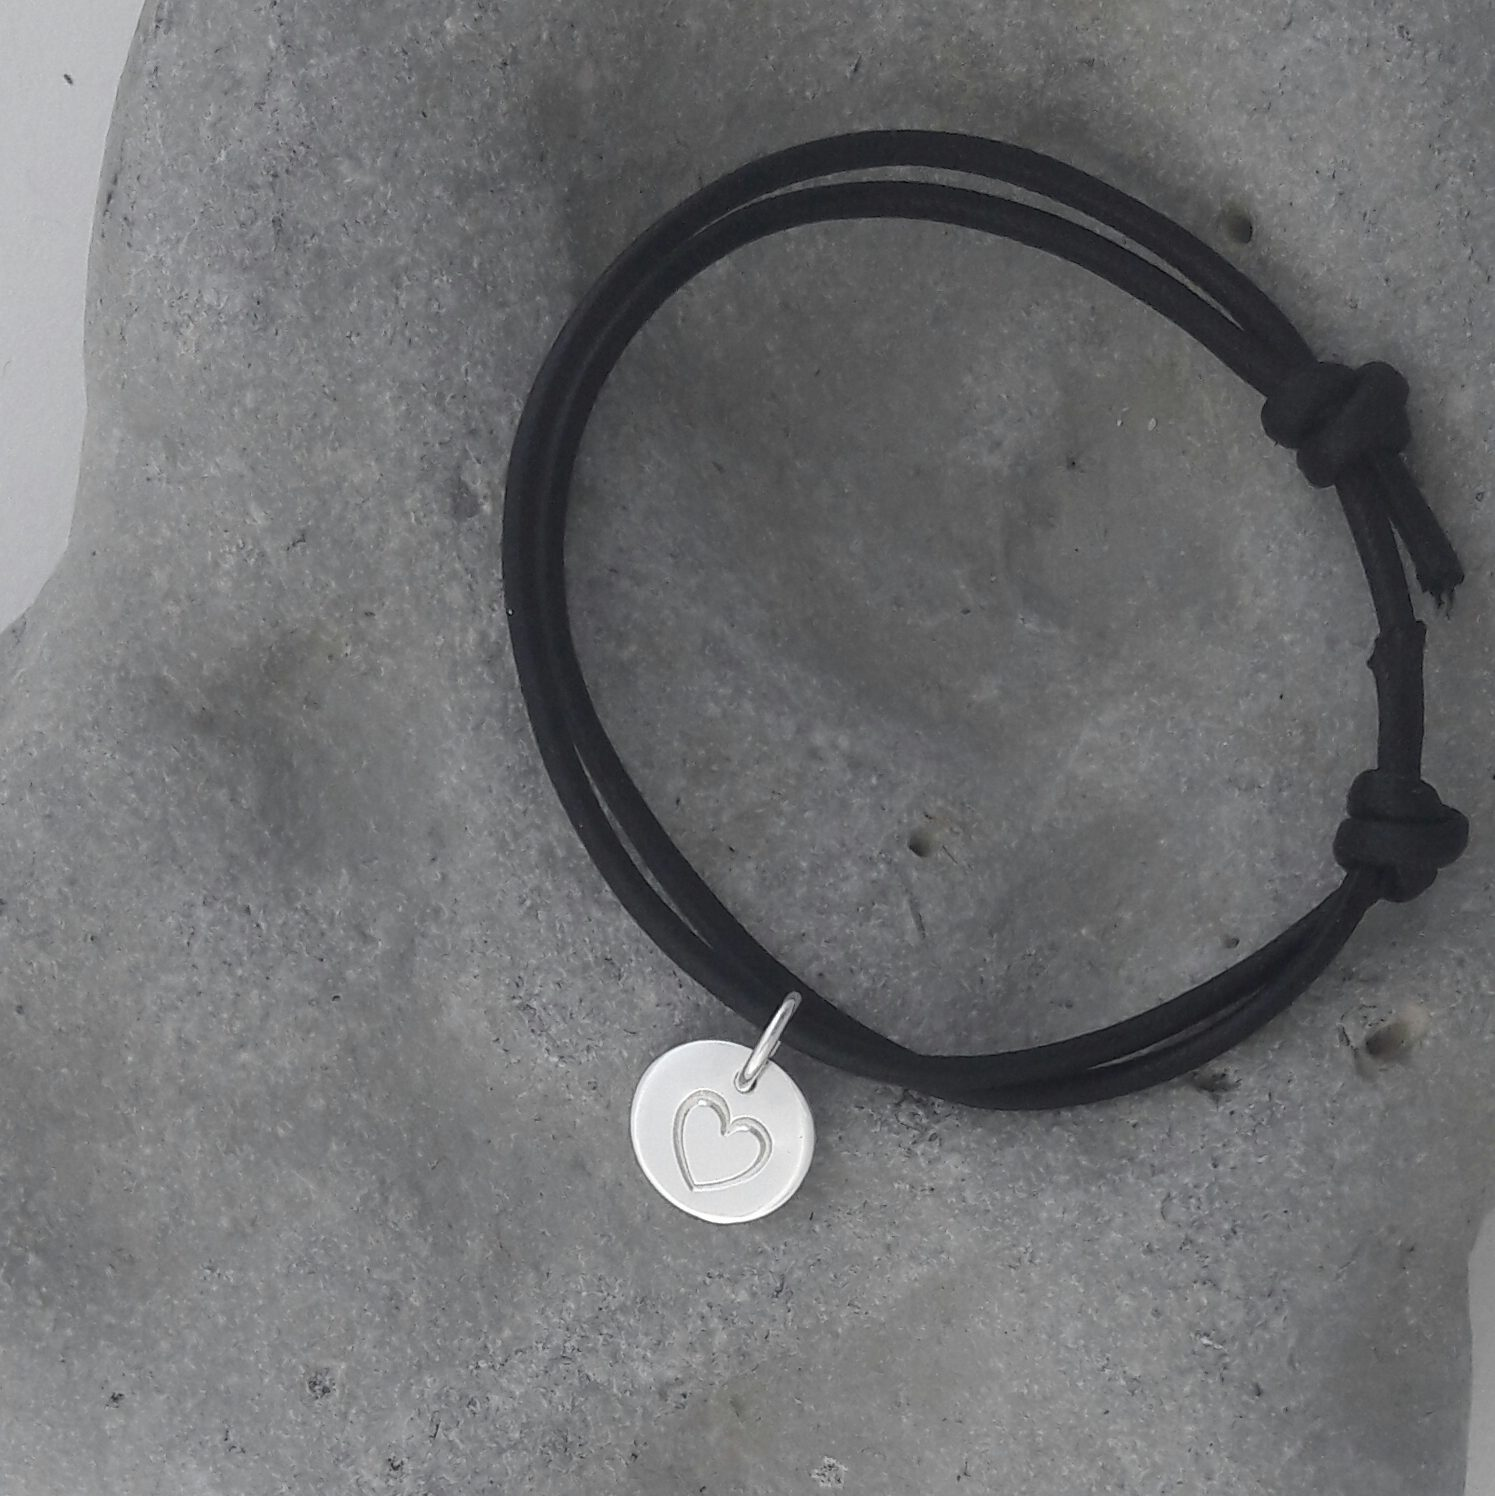 Smyckensmatt armband armrem hjarta e1504030246825 - Armrem med hjärta